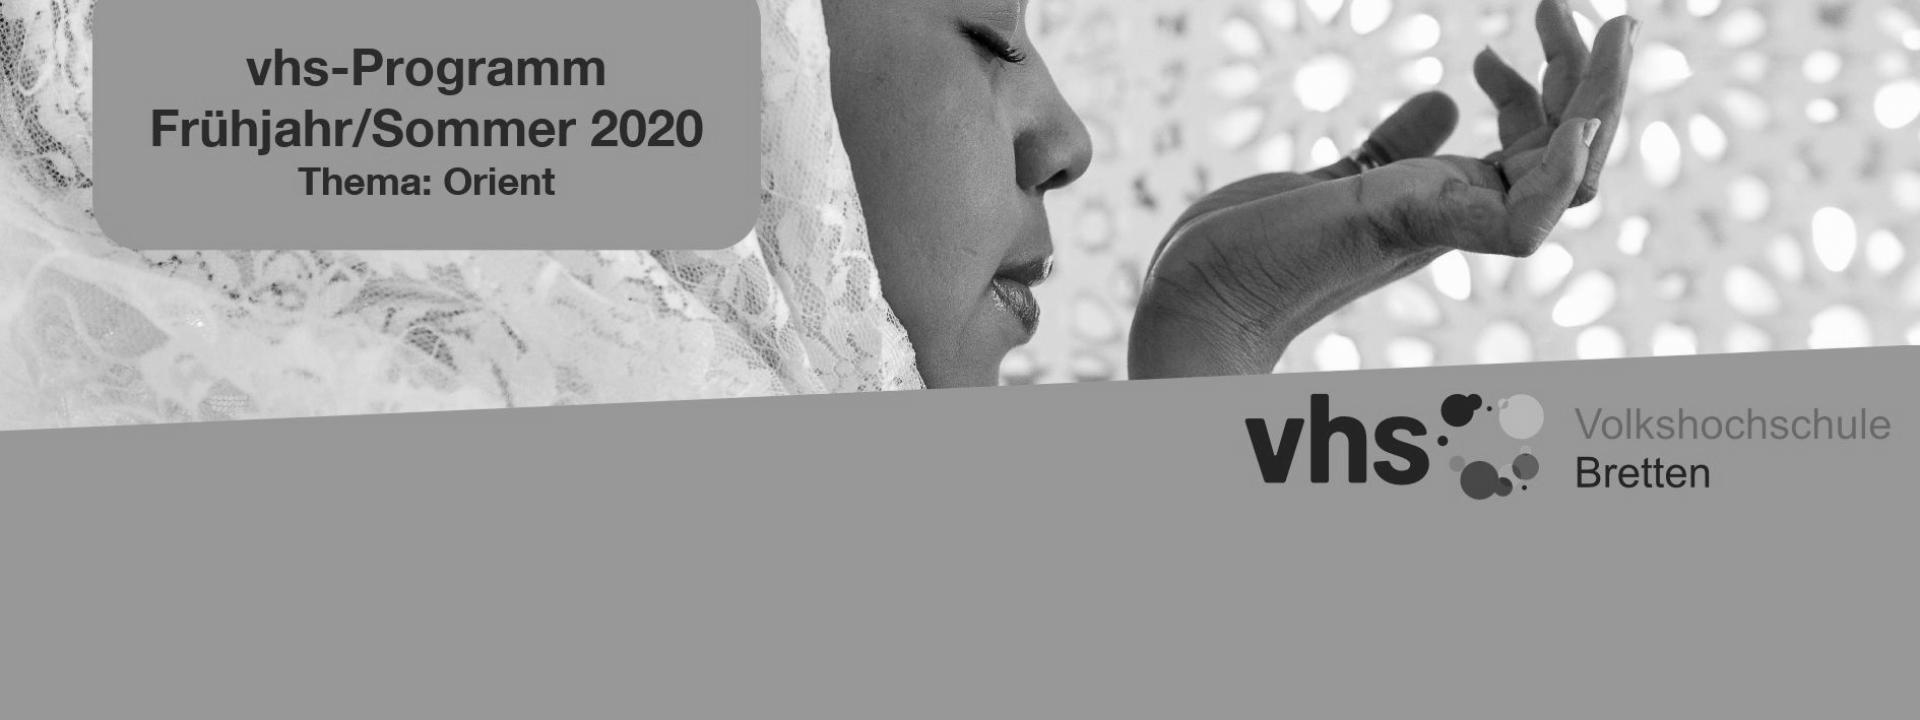 VHS Programm Frühjahr Sommer 2020